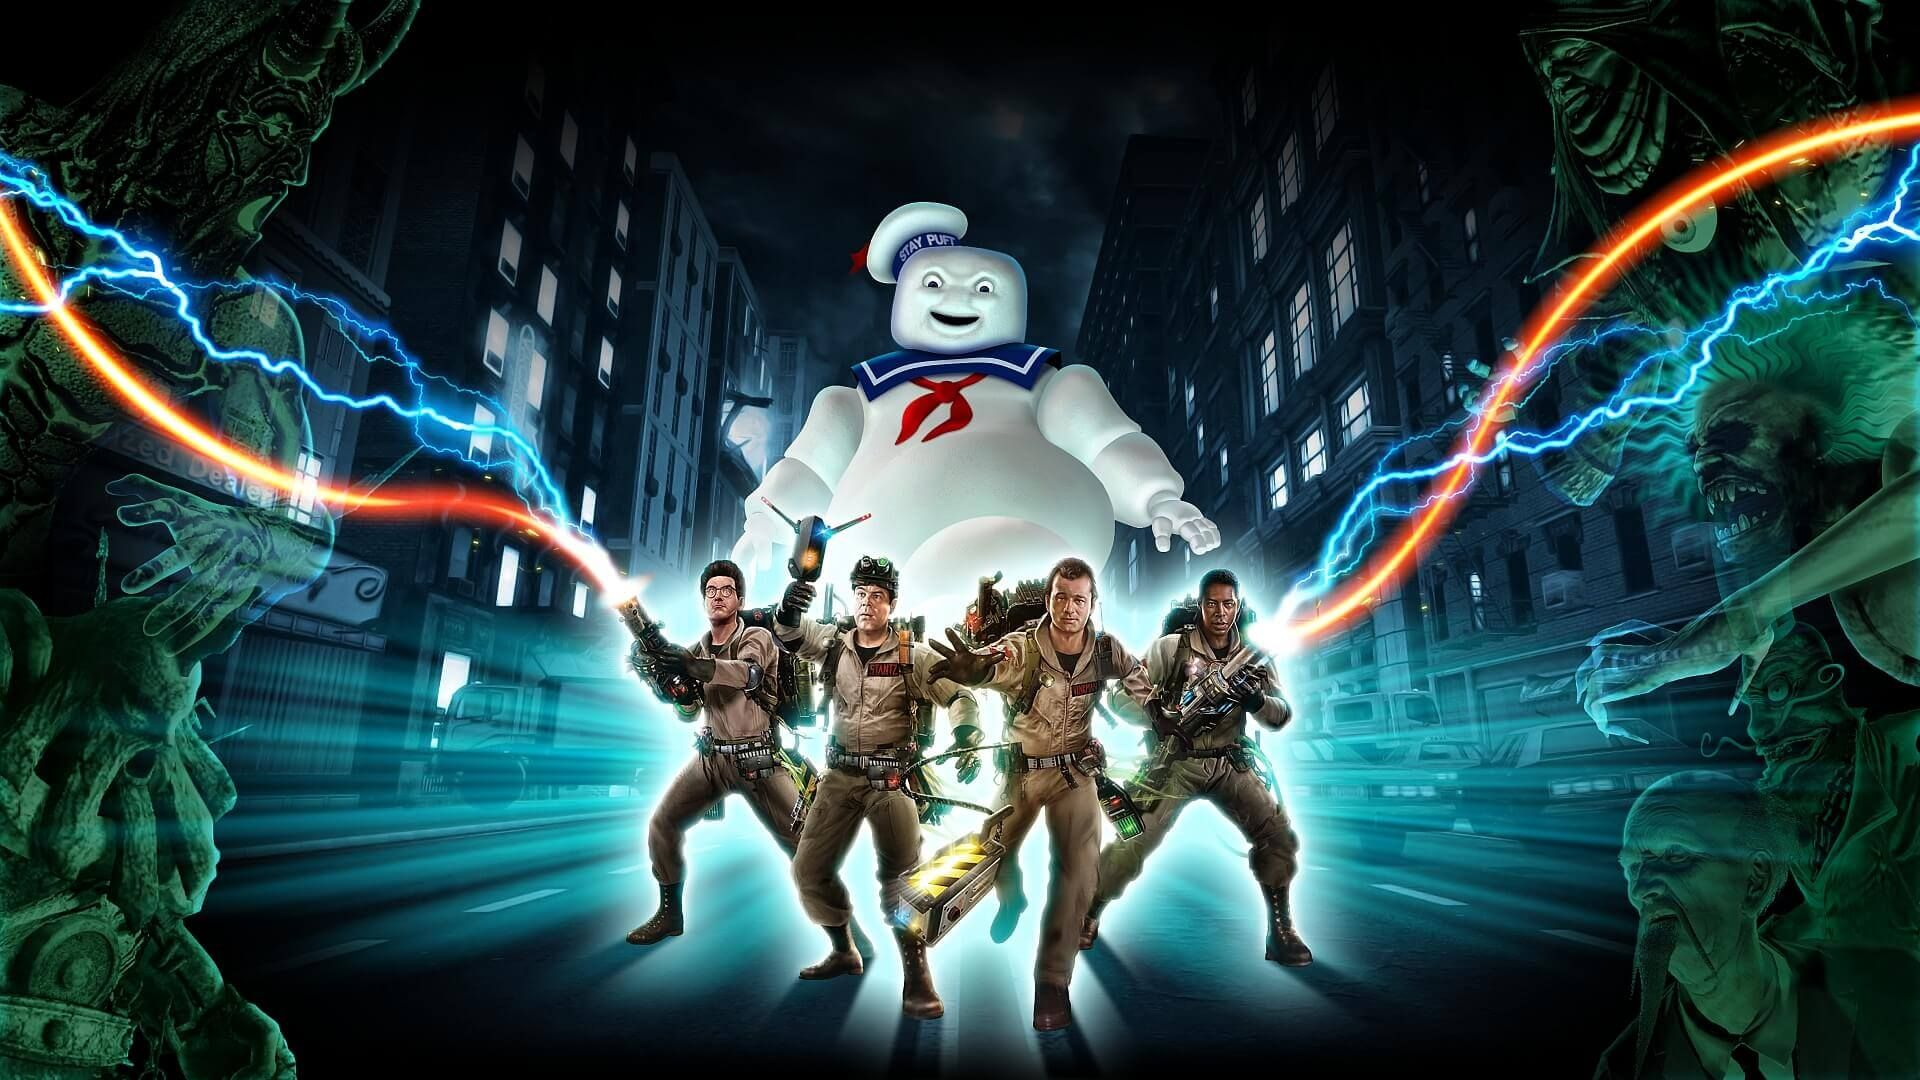 В Японском eShop появилась демо-версия Ghostbusters: The Video Game Remastered